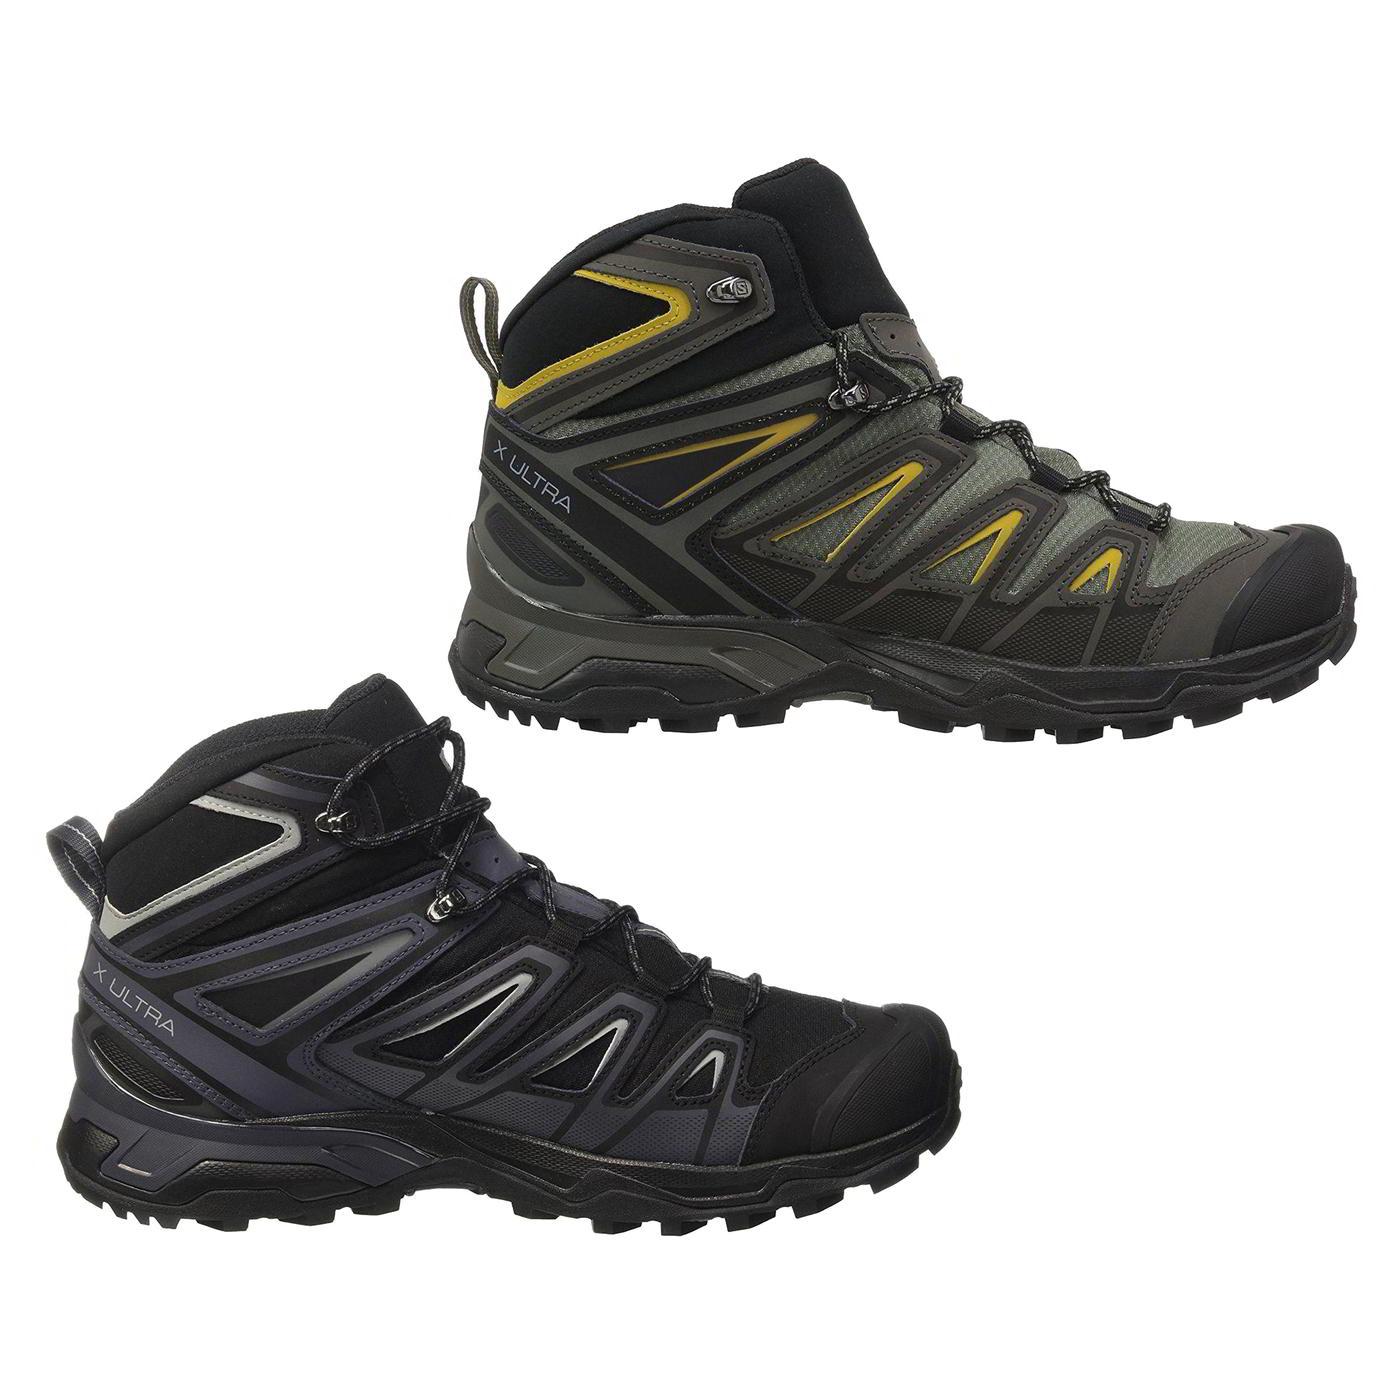 3a402b59622 Details about Salomon X Ultra 3 Mid GTX Mens Wide Waterproof Walking Hiking  Boots Size 8-11